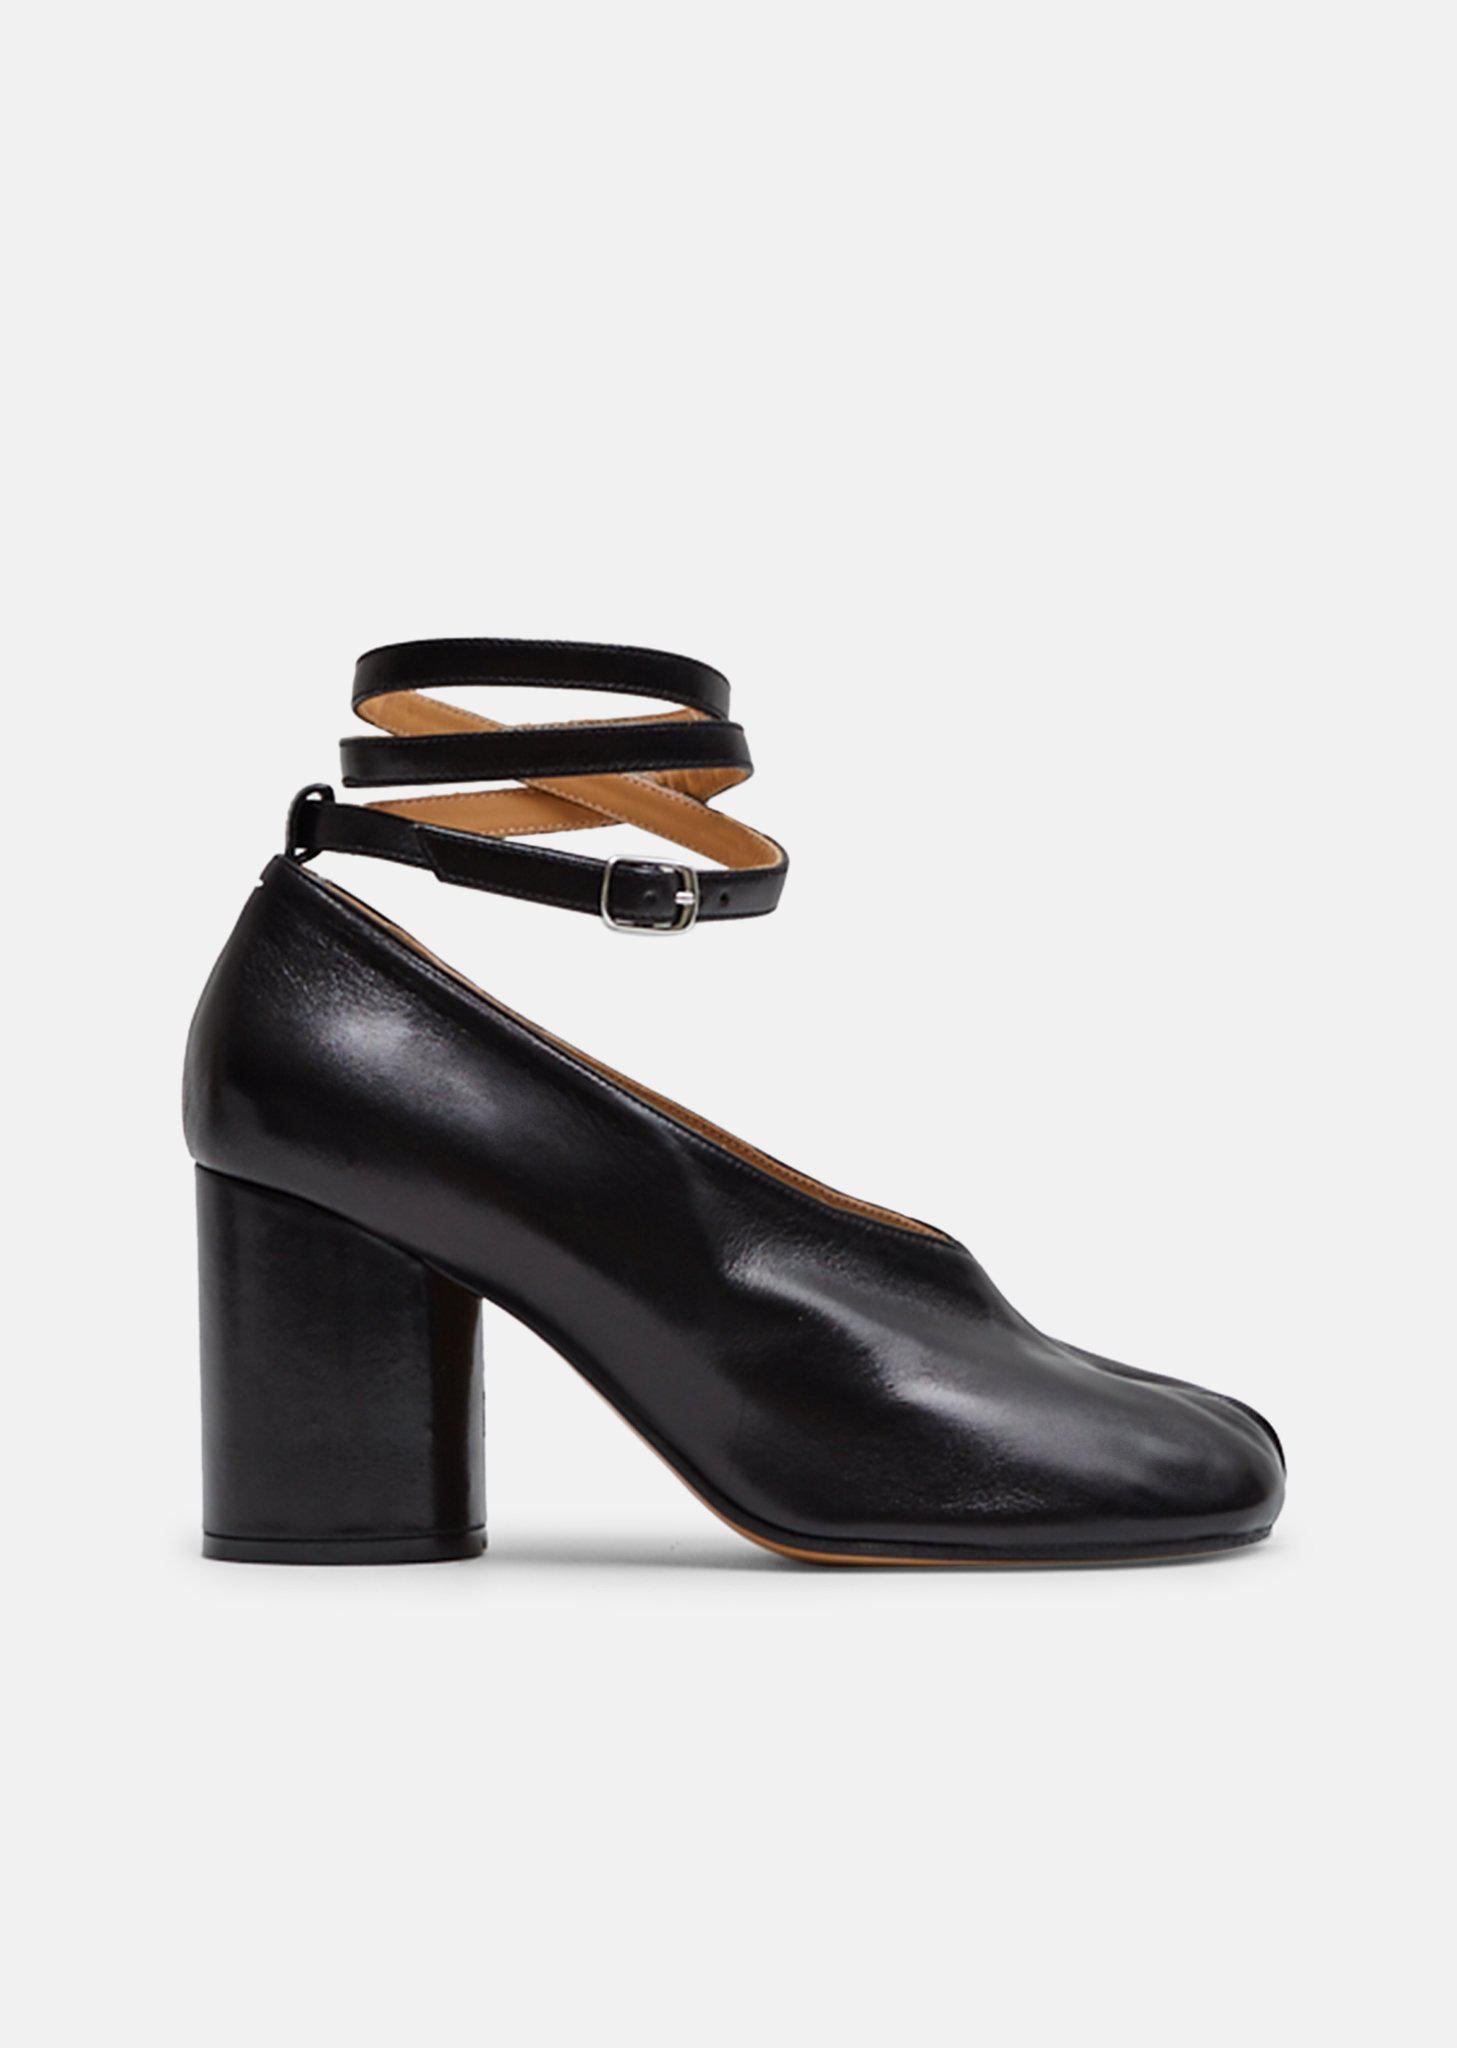 75963de1a2cd Lyst - Maison Margiela Tabi Heels With Ankle Straps in Black